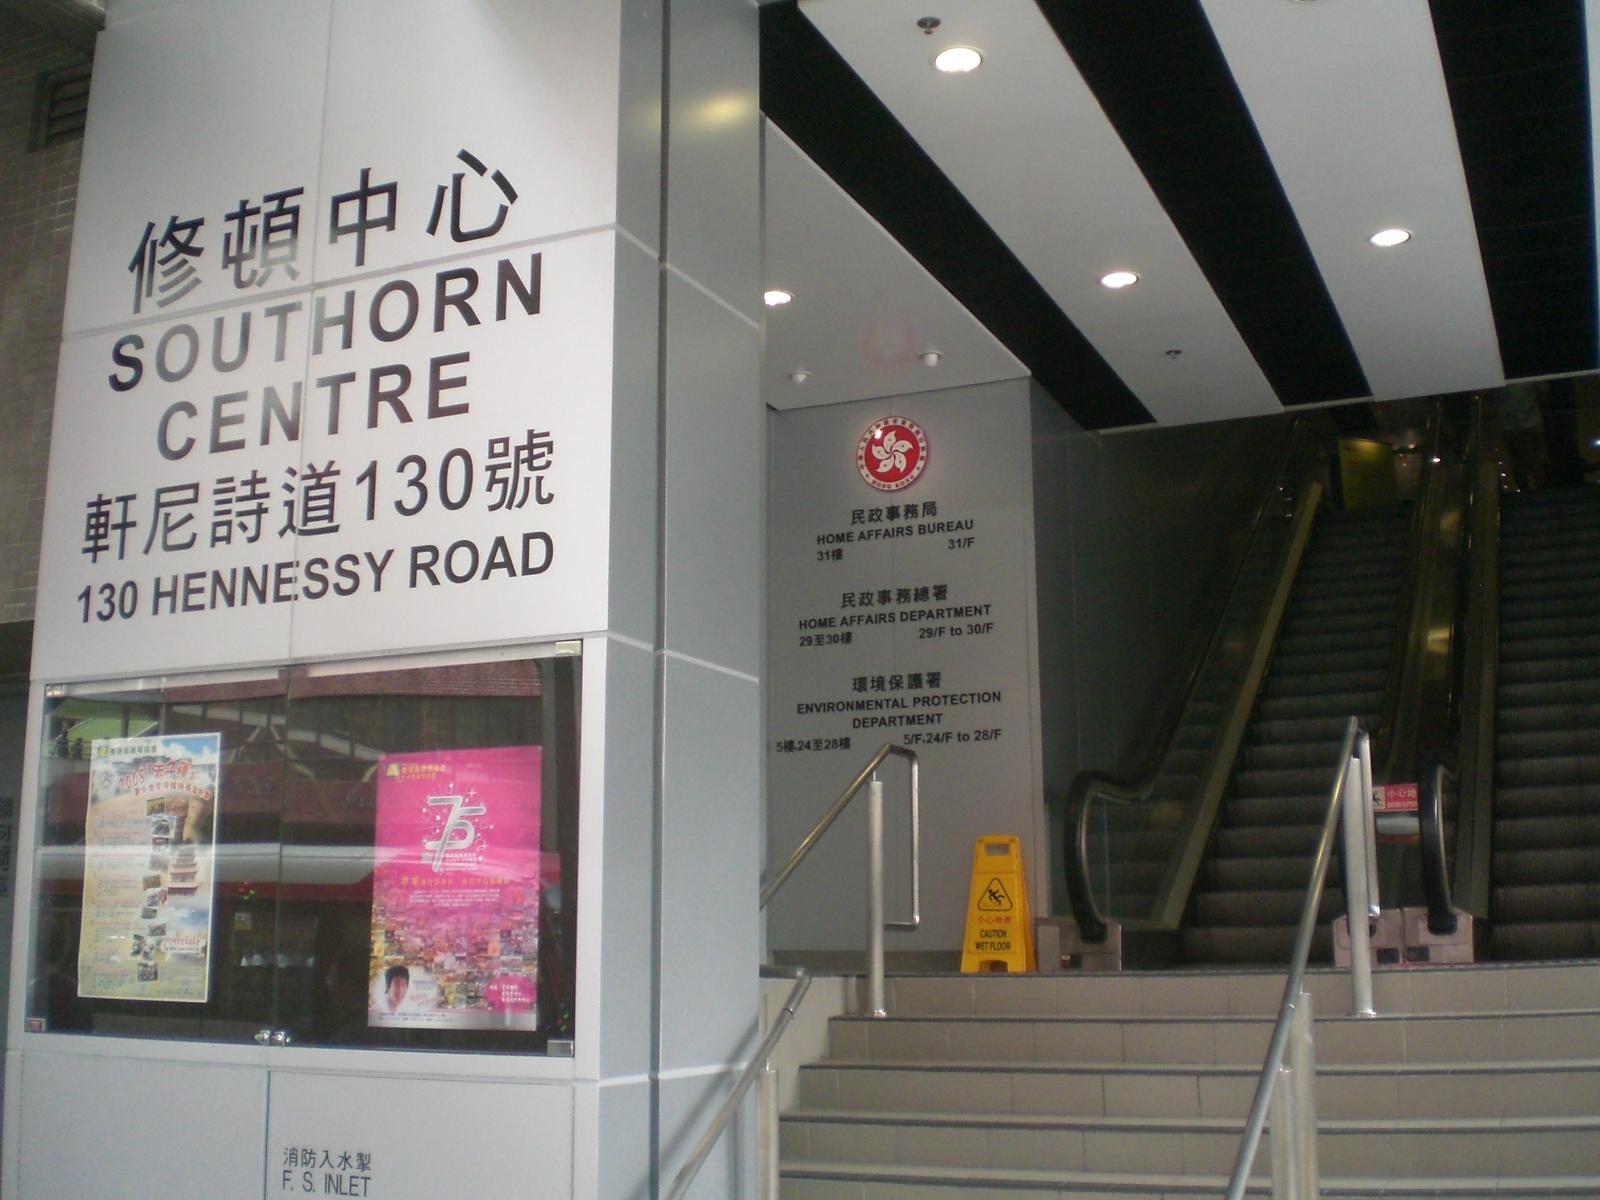 Southorn_Centre